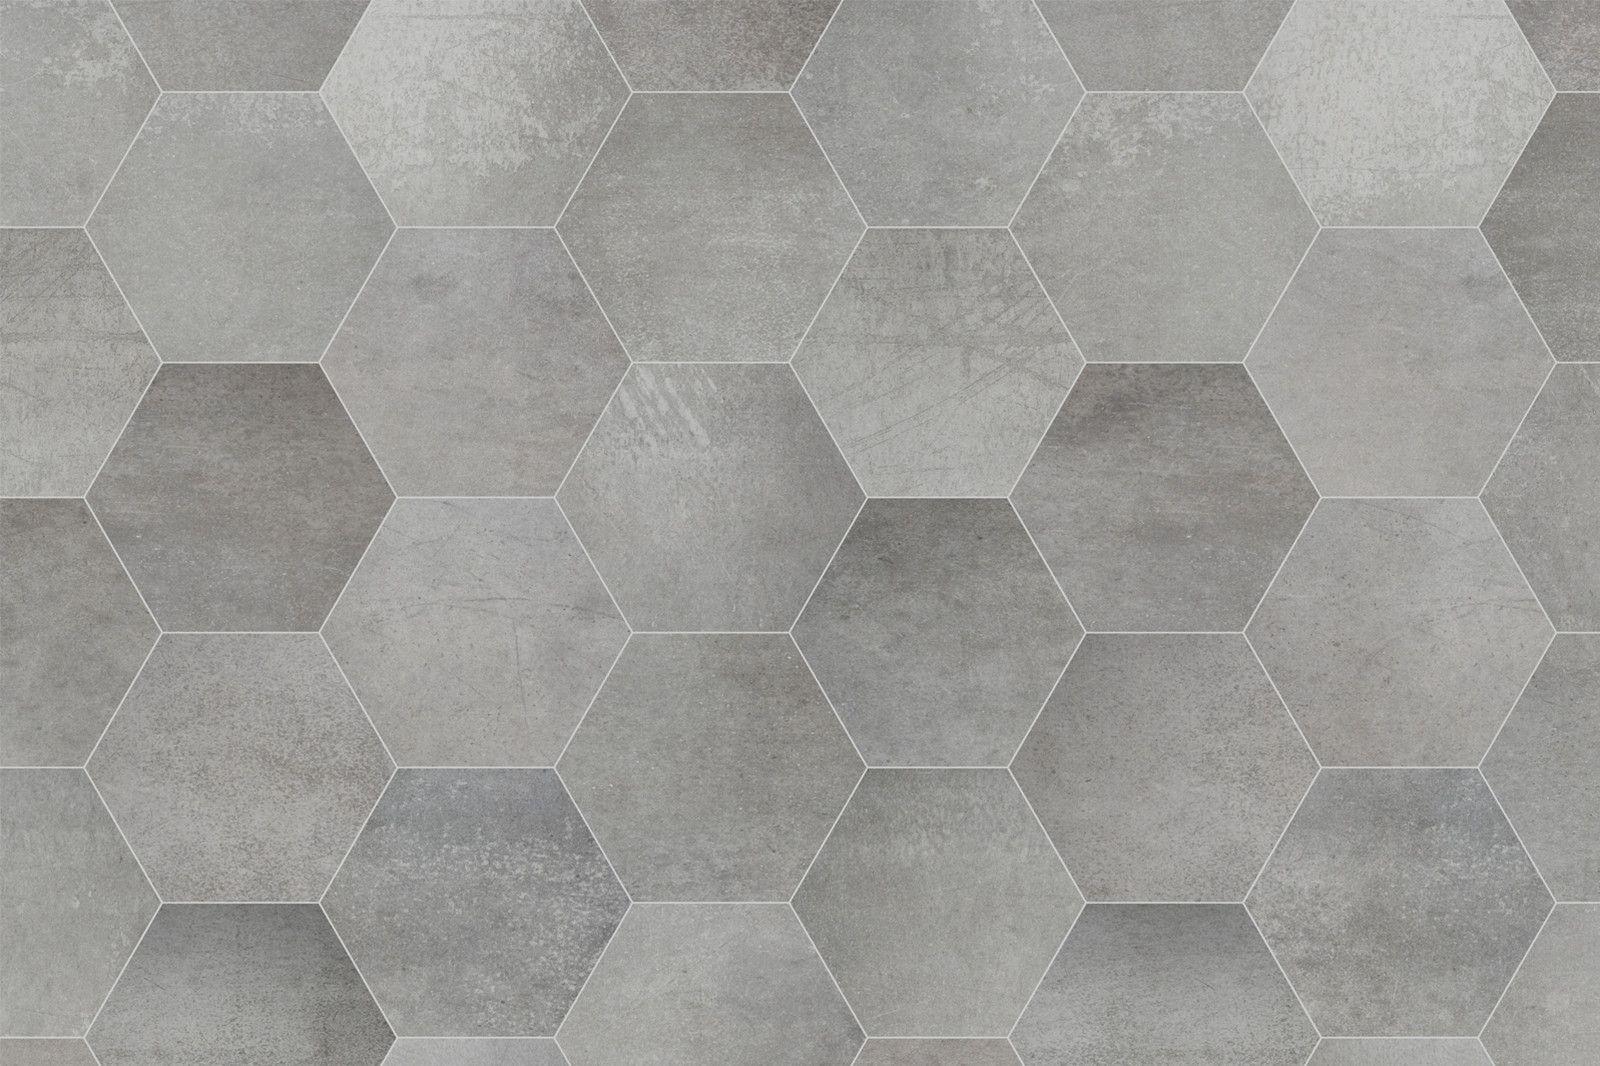 6 Hoekige Tegels : Concrete l m g  vloeren